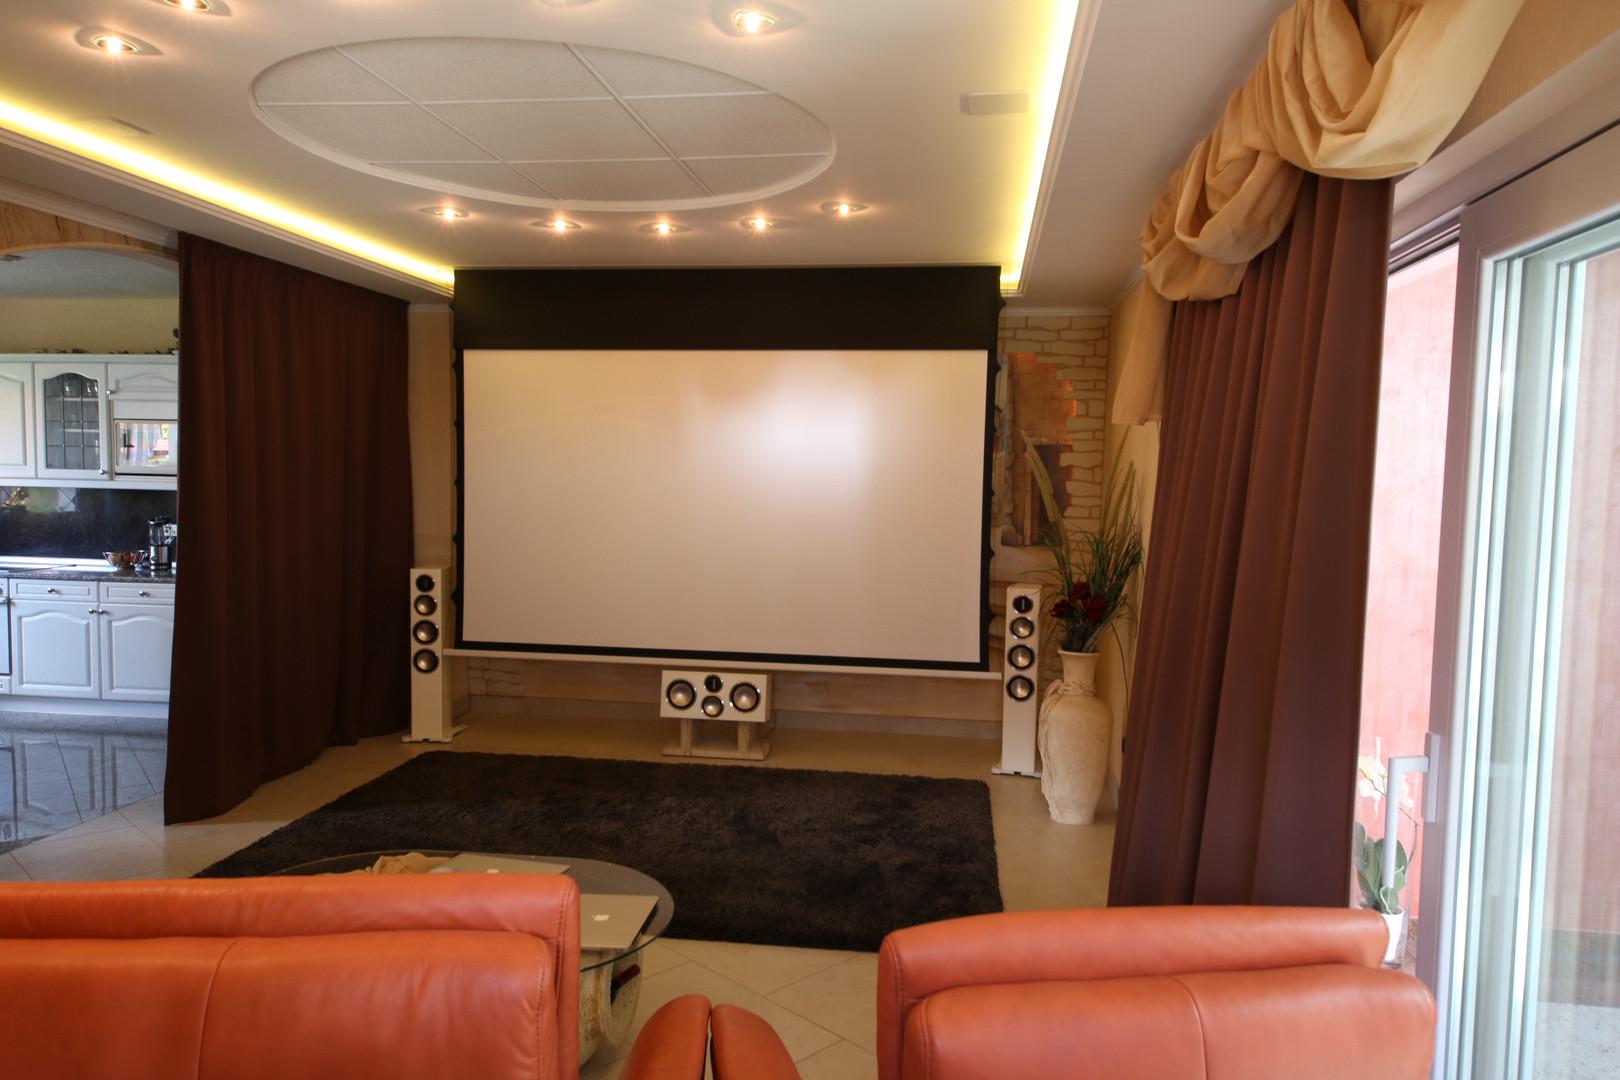 Heimkino Gardasee-Kino-im-Wohnzimmer